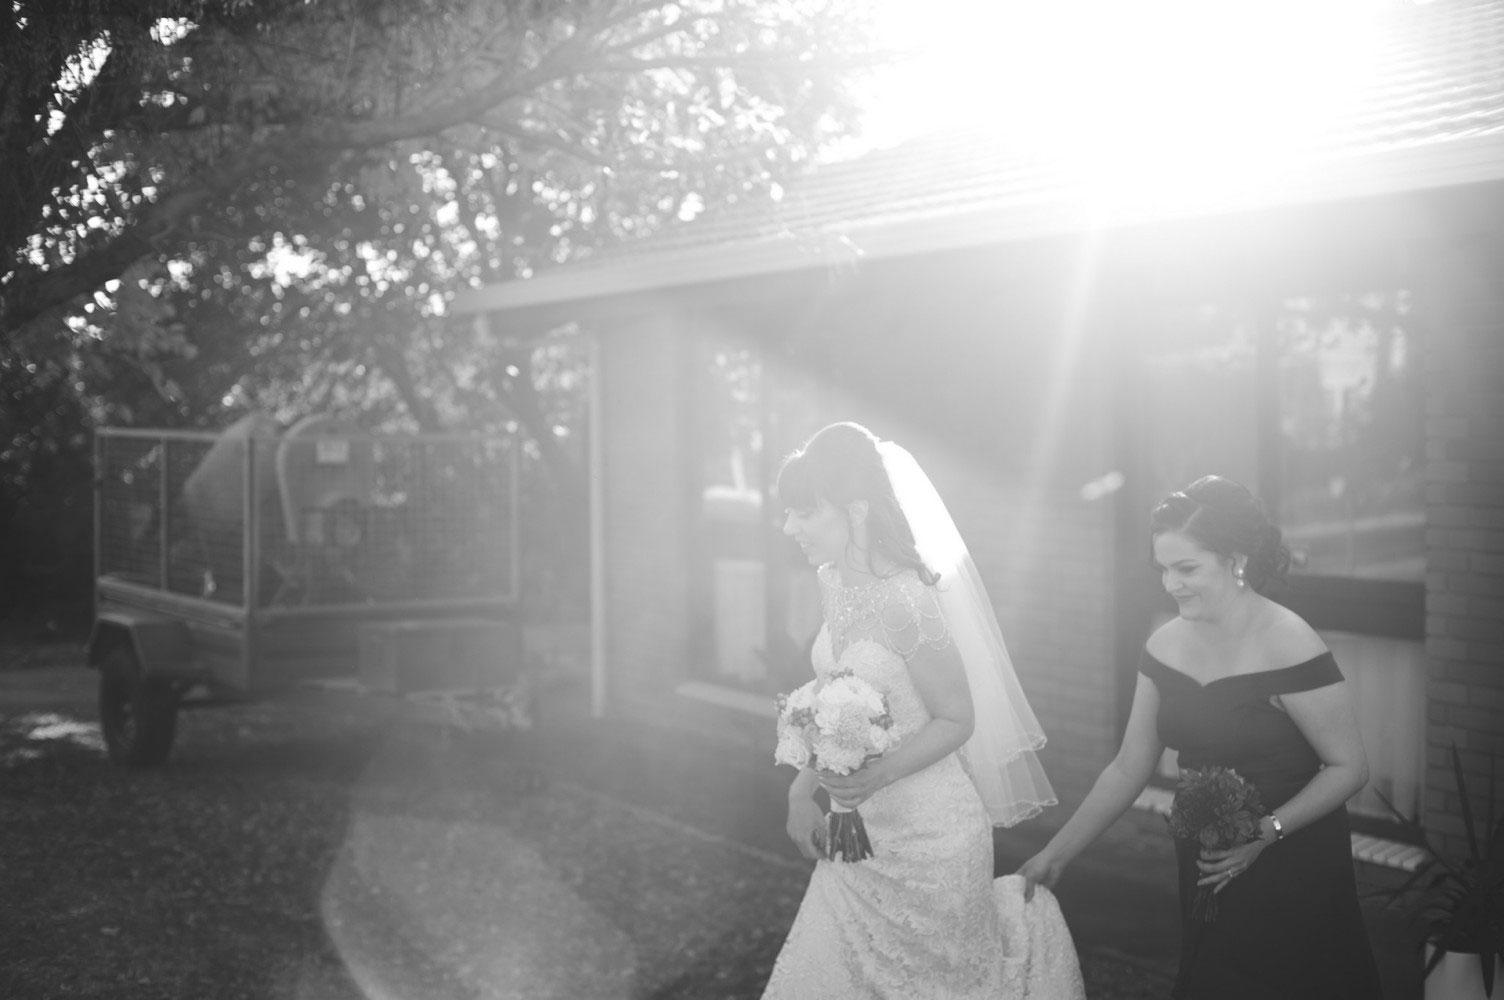 Jessica-Lemon-Photography-Adelaide-Wedding-Photographer-Bride-Leaving-House.jpg